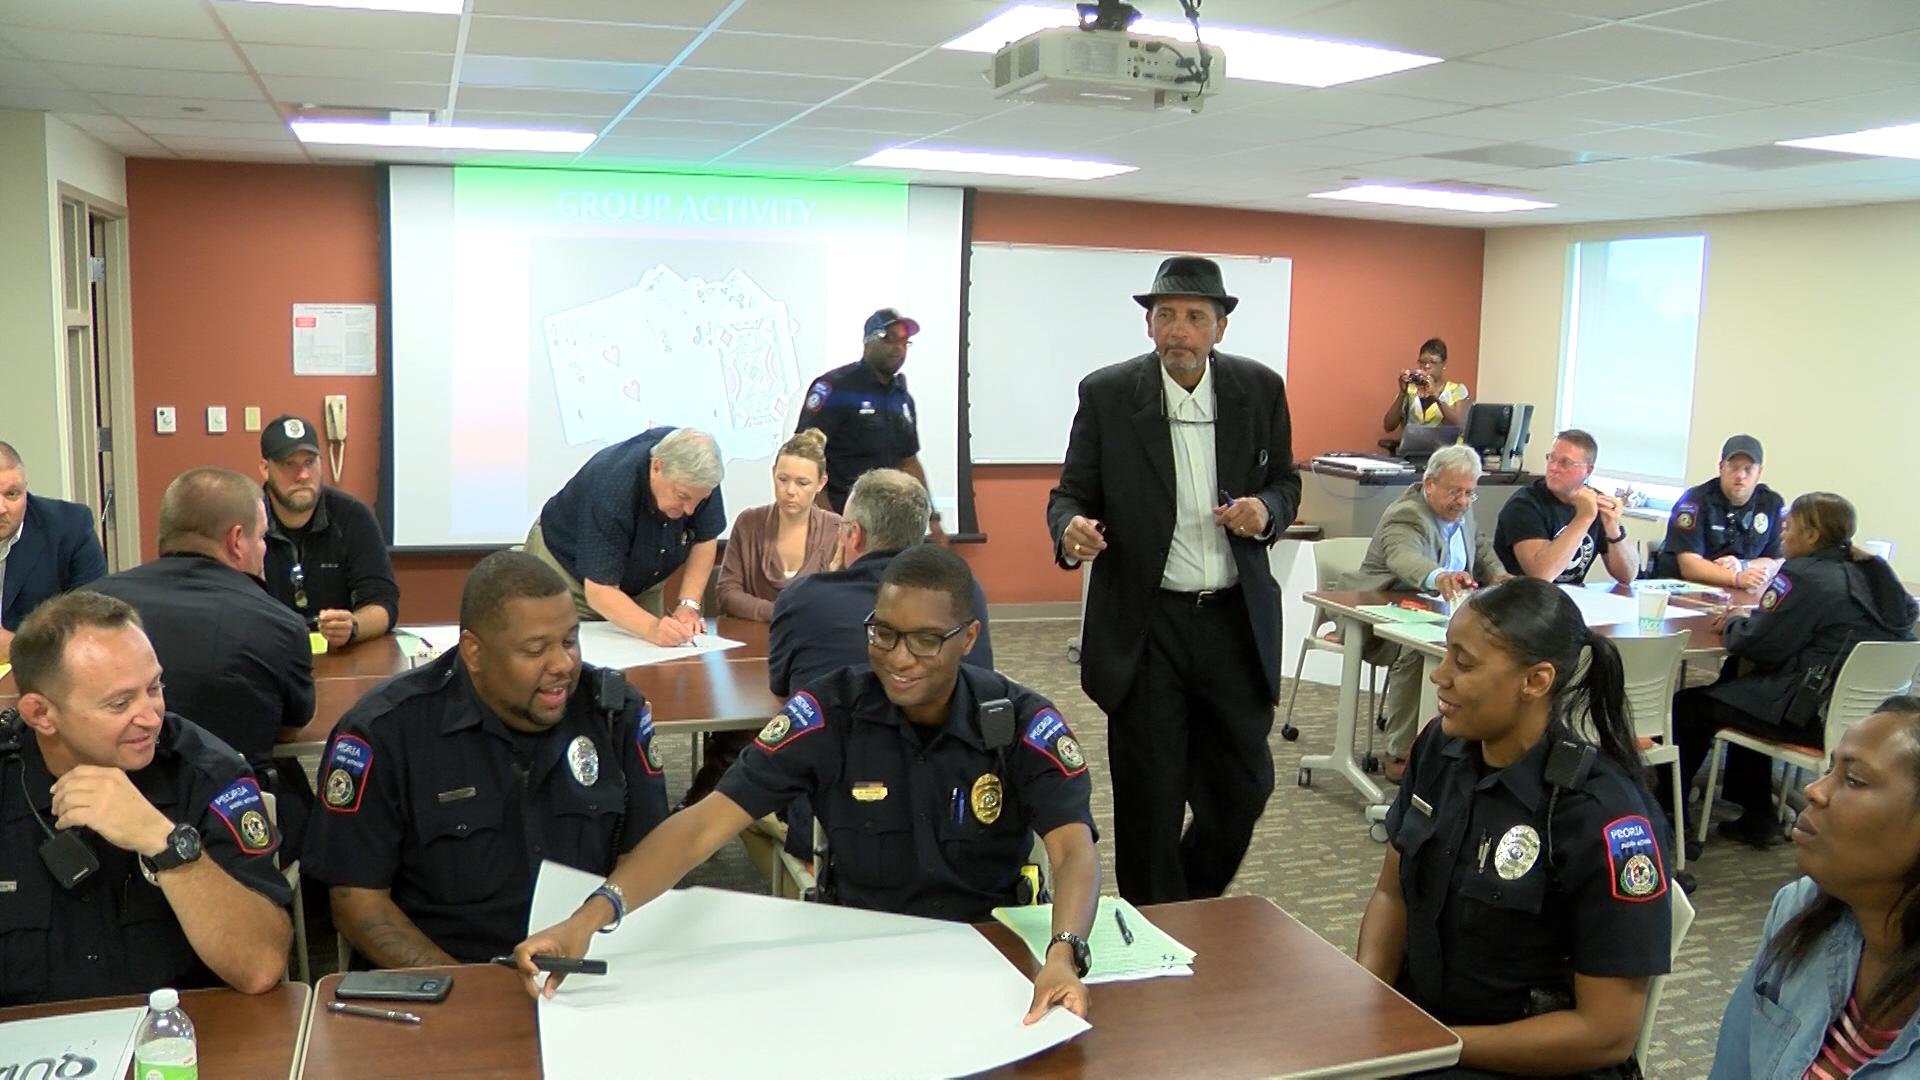 Diversity Training_1537996227416.jpg.jpg